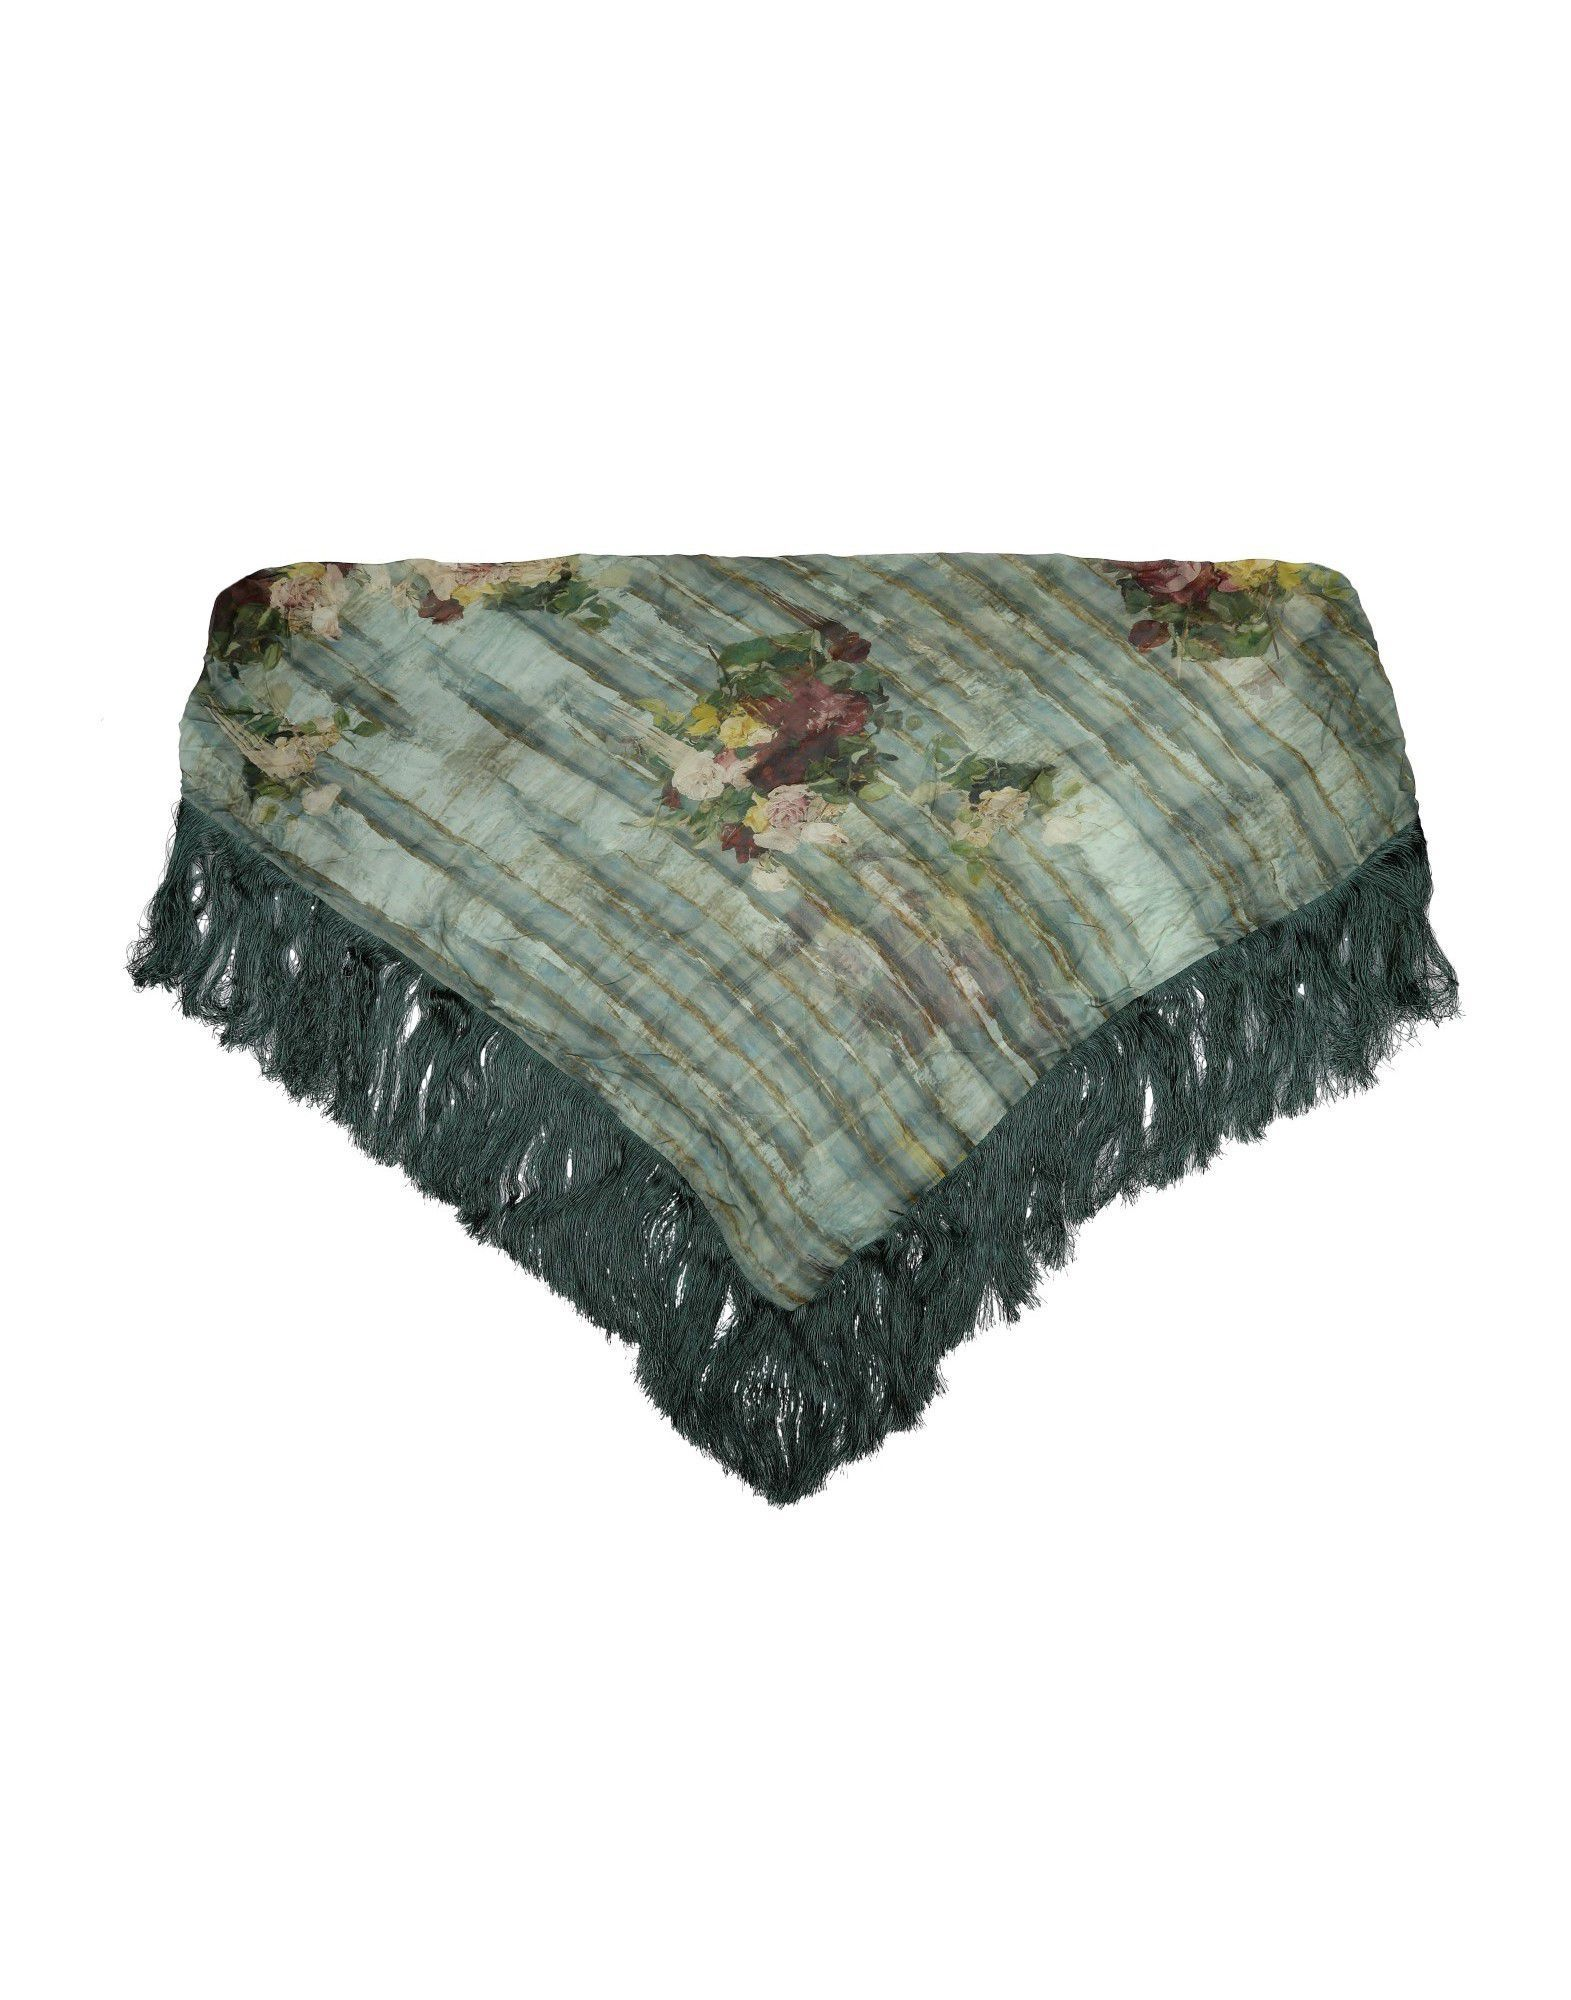 Alberta Ferretti Green Floral Design Silk Voile Fringed Scarf